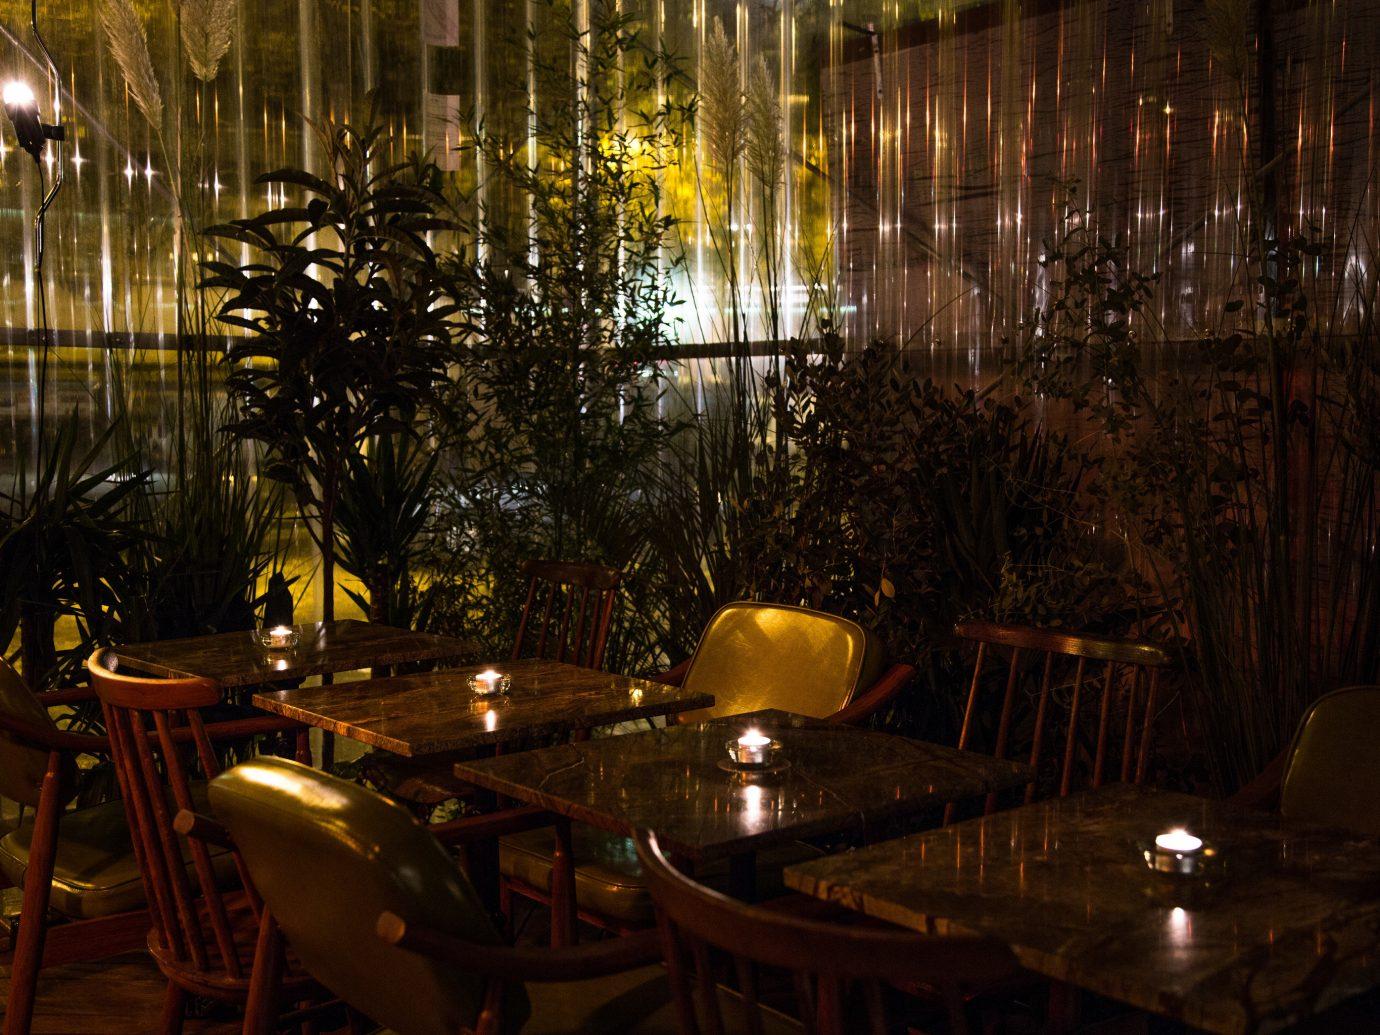 Food + Drink Luxury Travel News Style + Design Trip Ideas table lighting restaurant night plant tree interior design landscape lighting sunlight evening darkness reflection Resort dining table